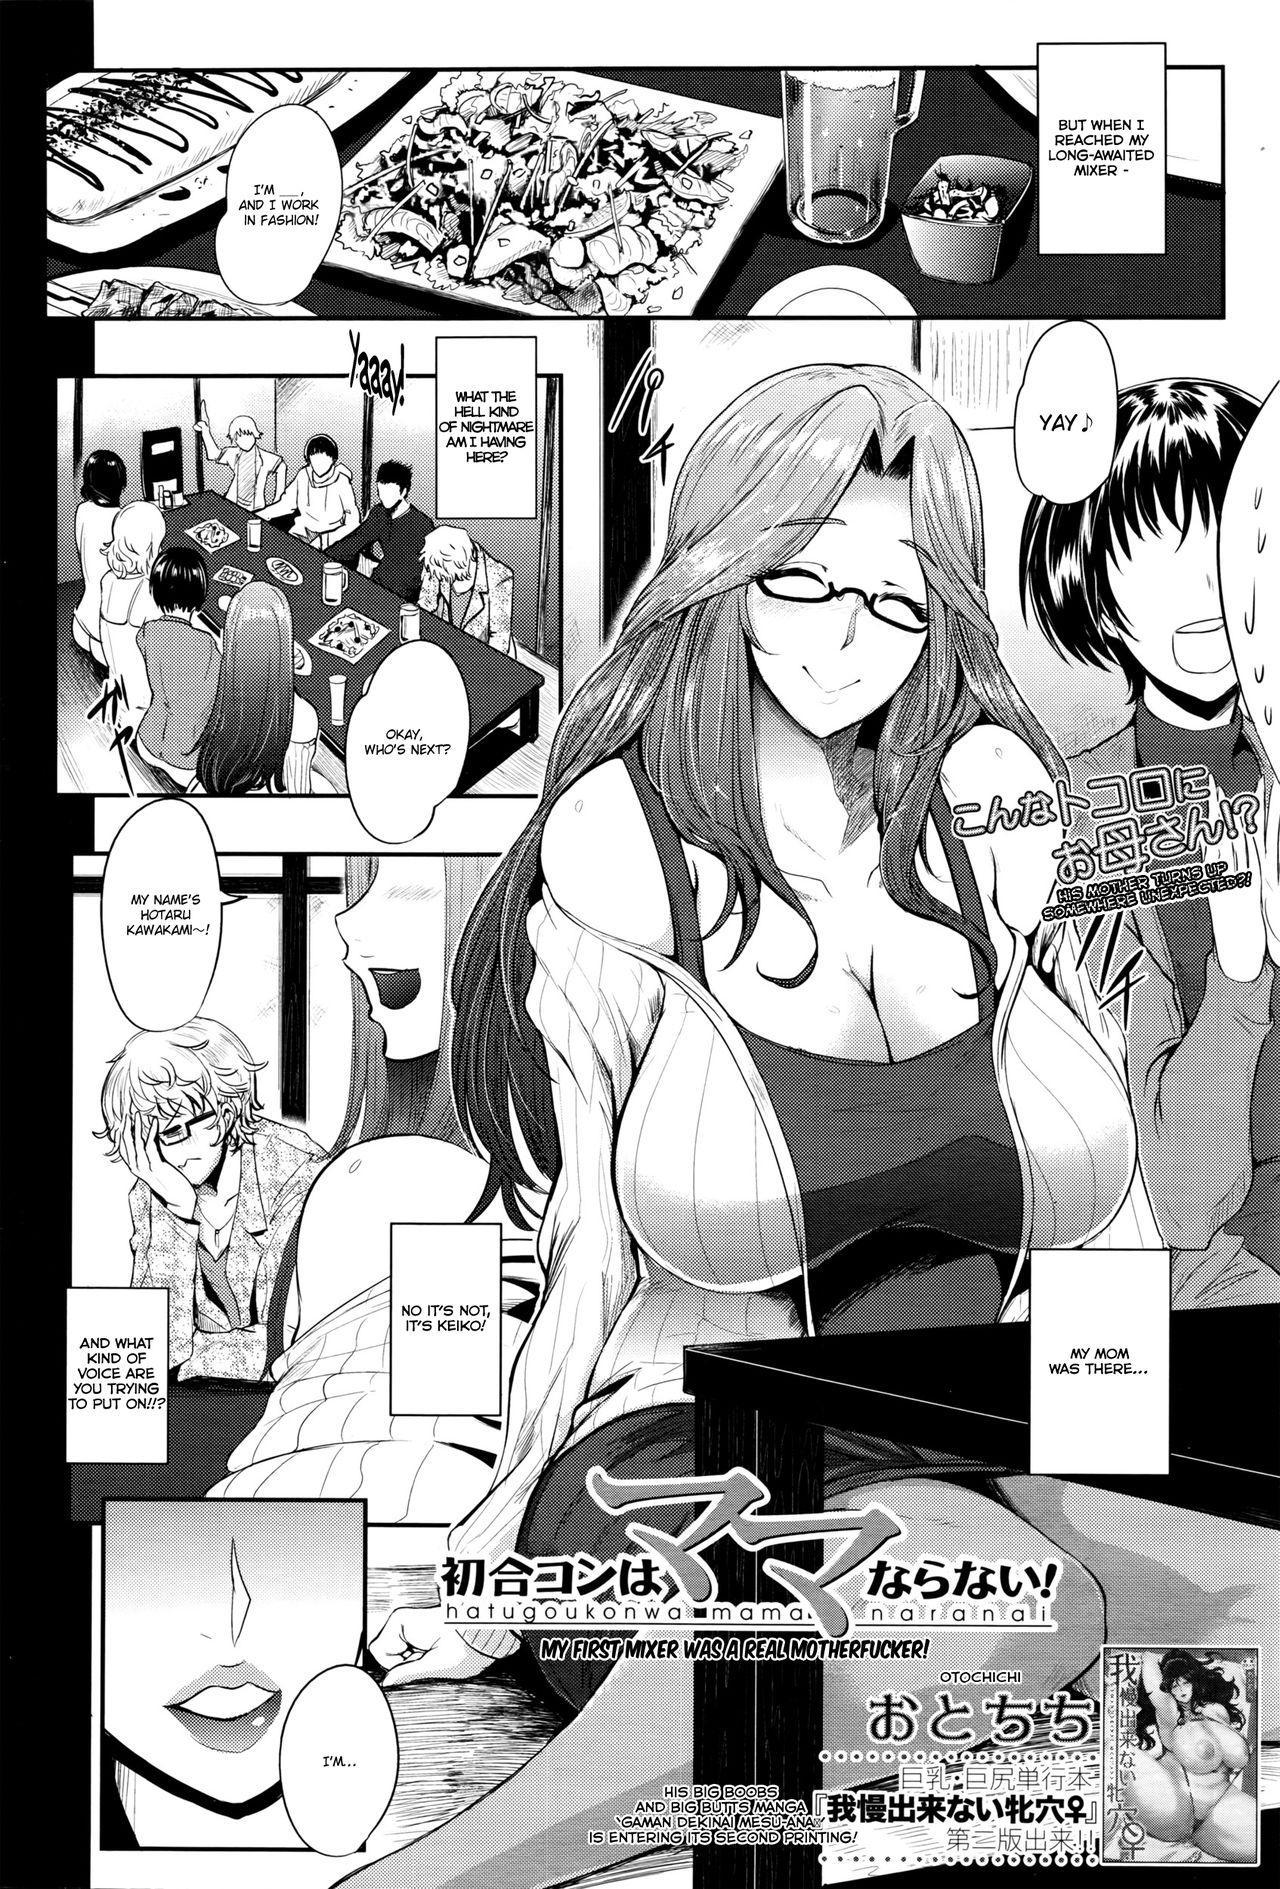 Hatsu Goukon wa Mama Naranai! | My First Mixer Was a Real Motherfucker! 1